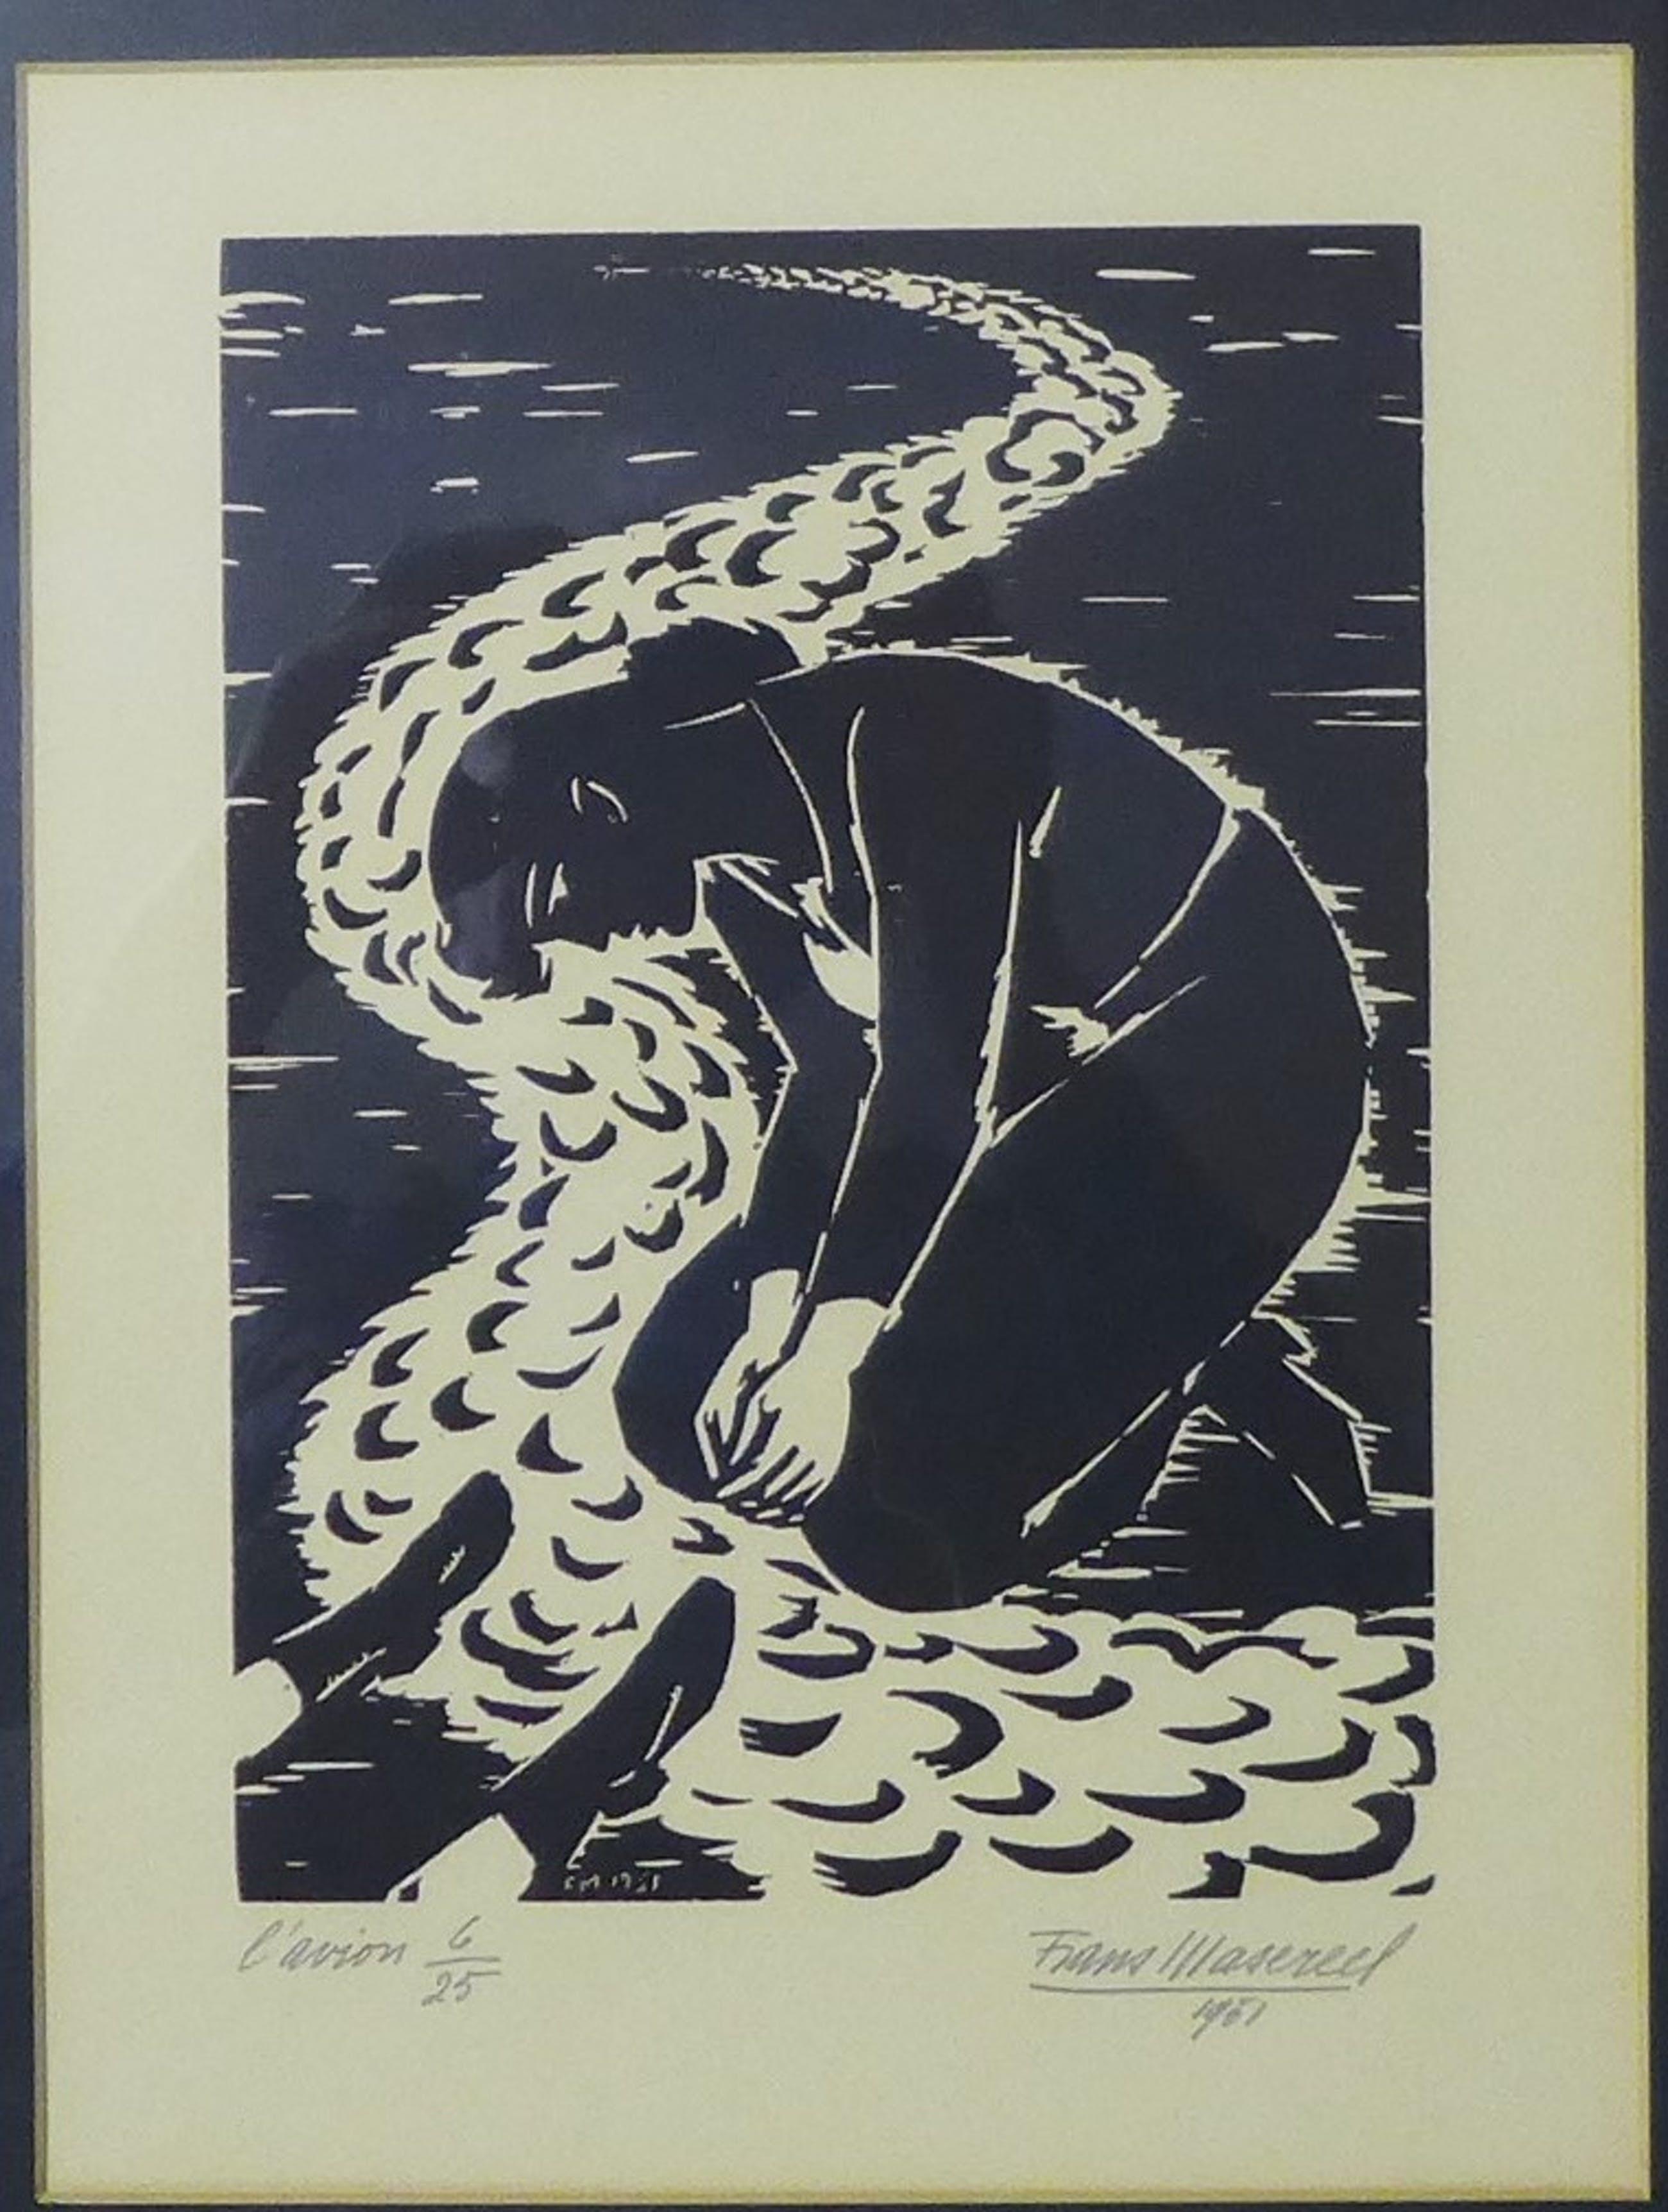 Frans Masereel - Linosnede uit 1951 kleine oplage 6/25 kopen? Bied vanaf 275!